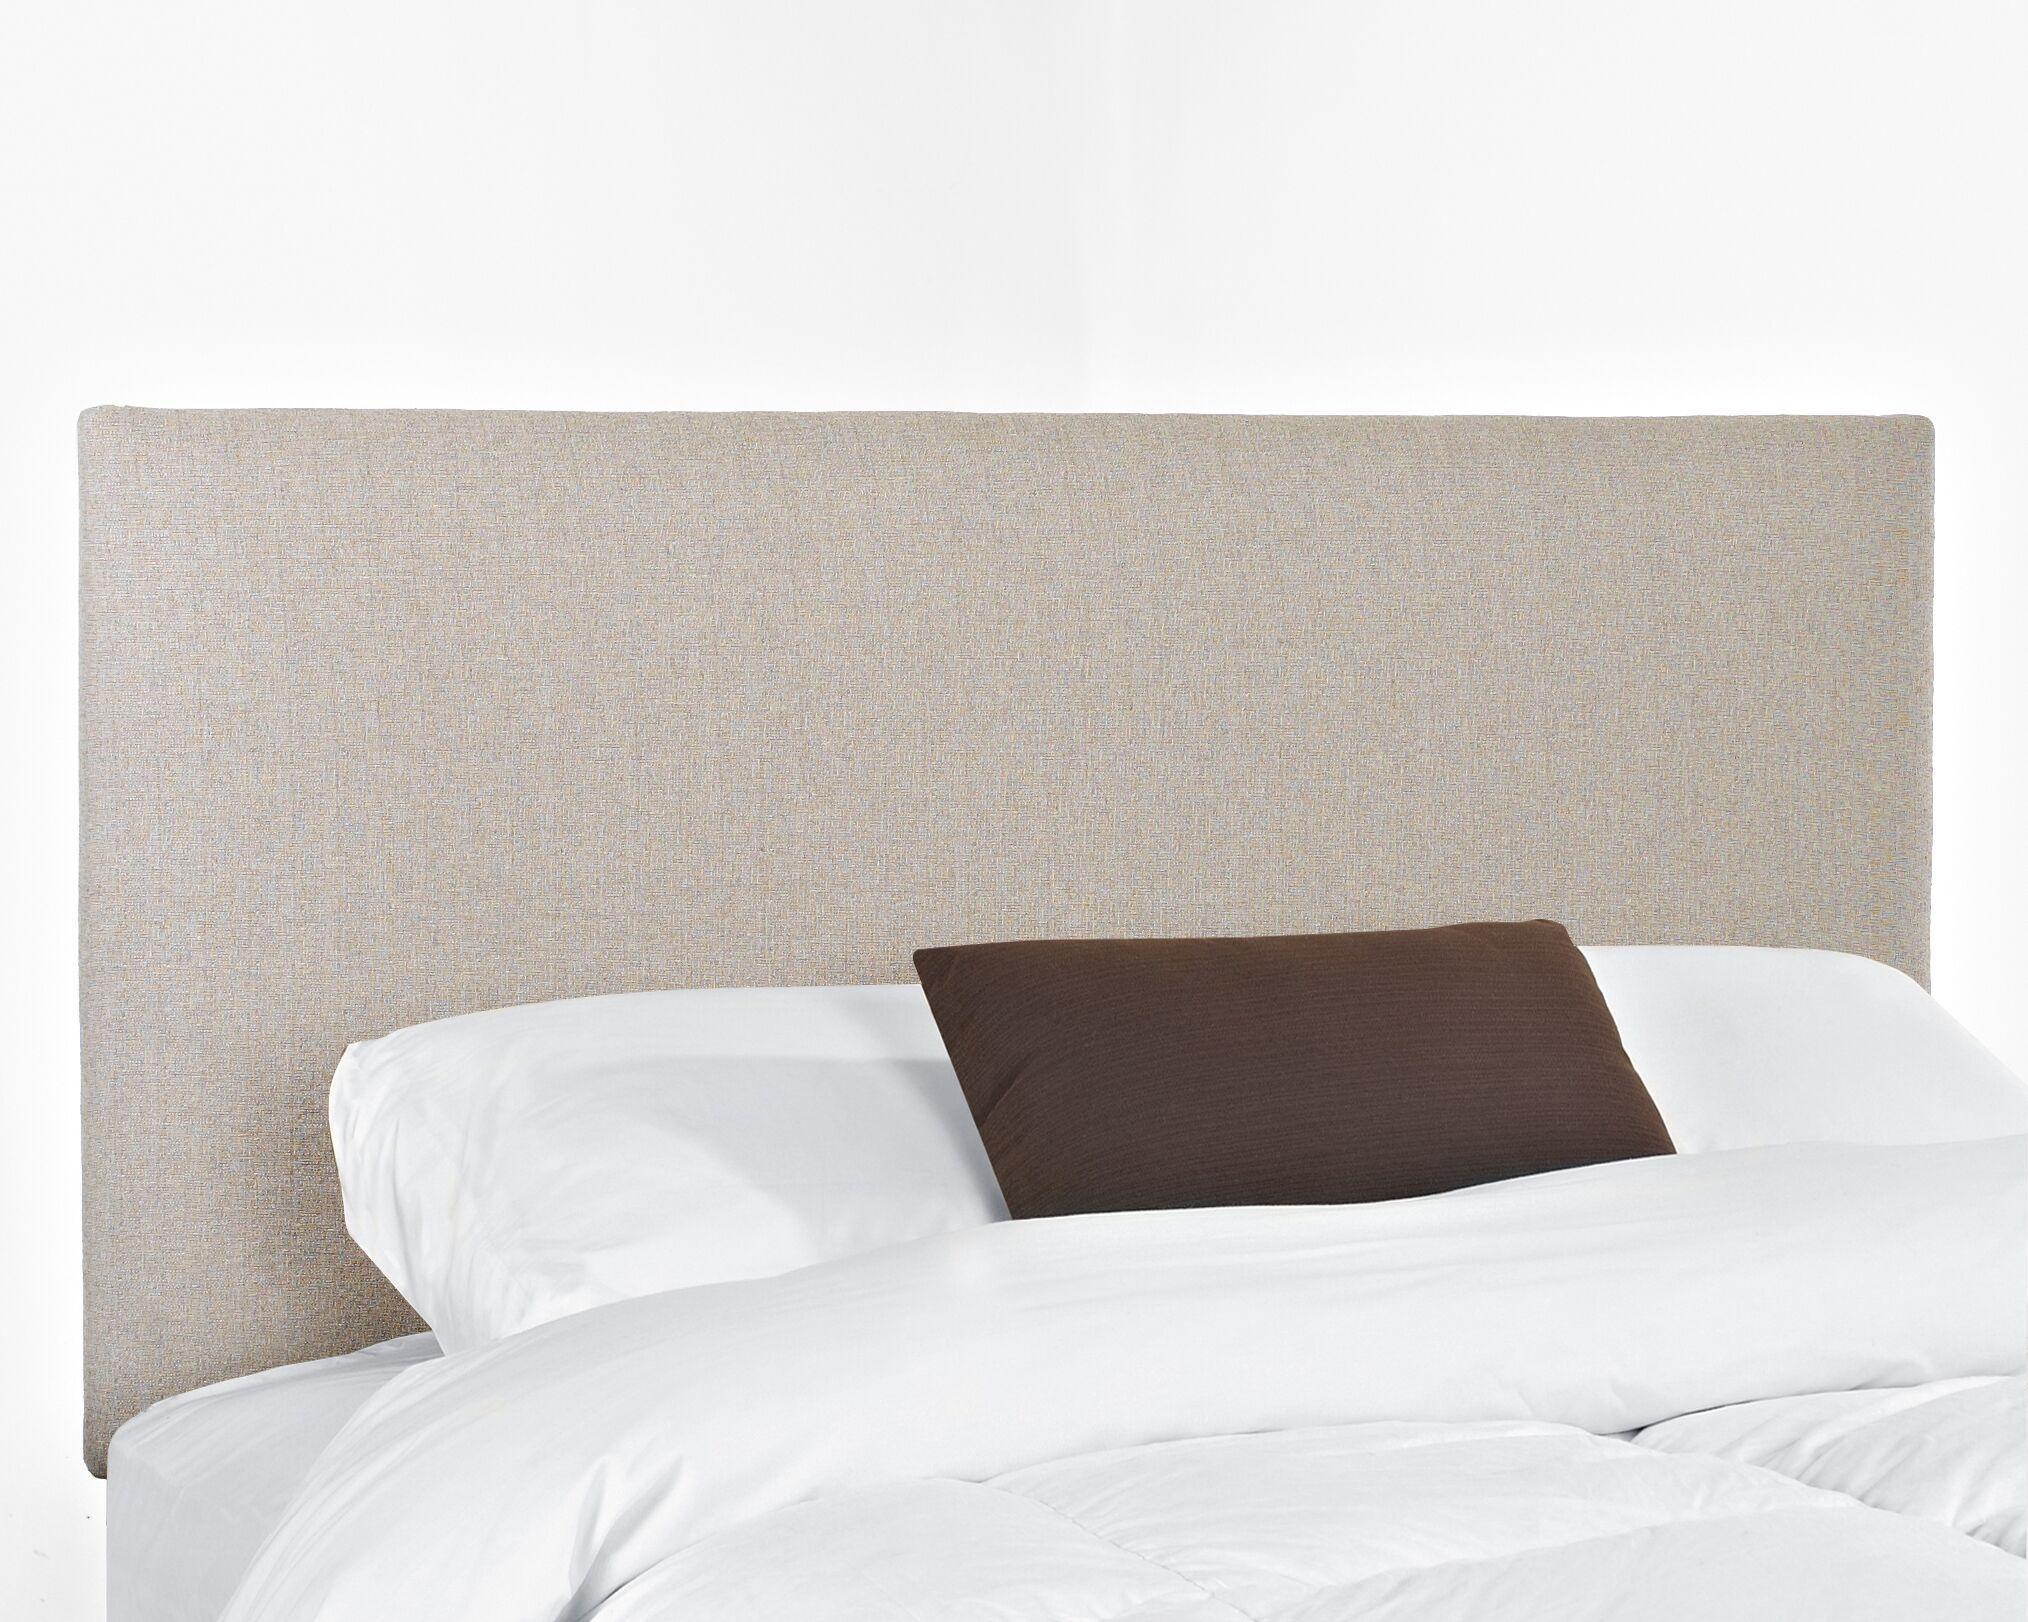 Killarney Upholstered Panel Headboard Size: King